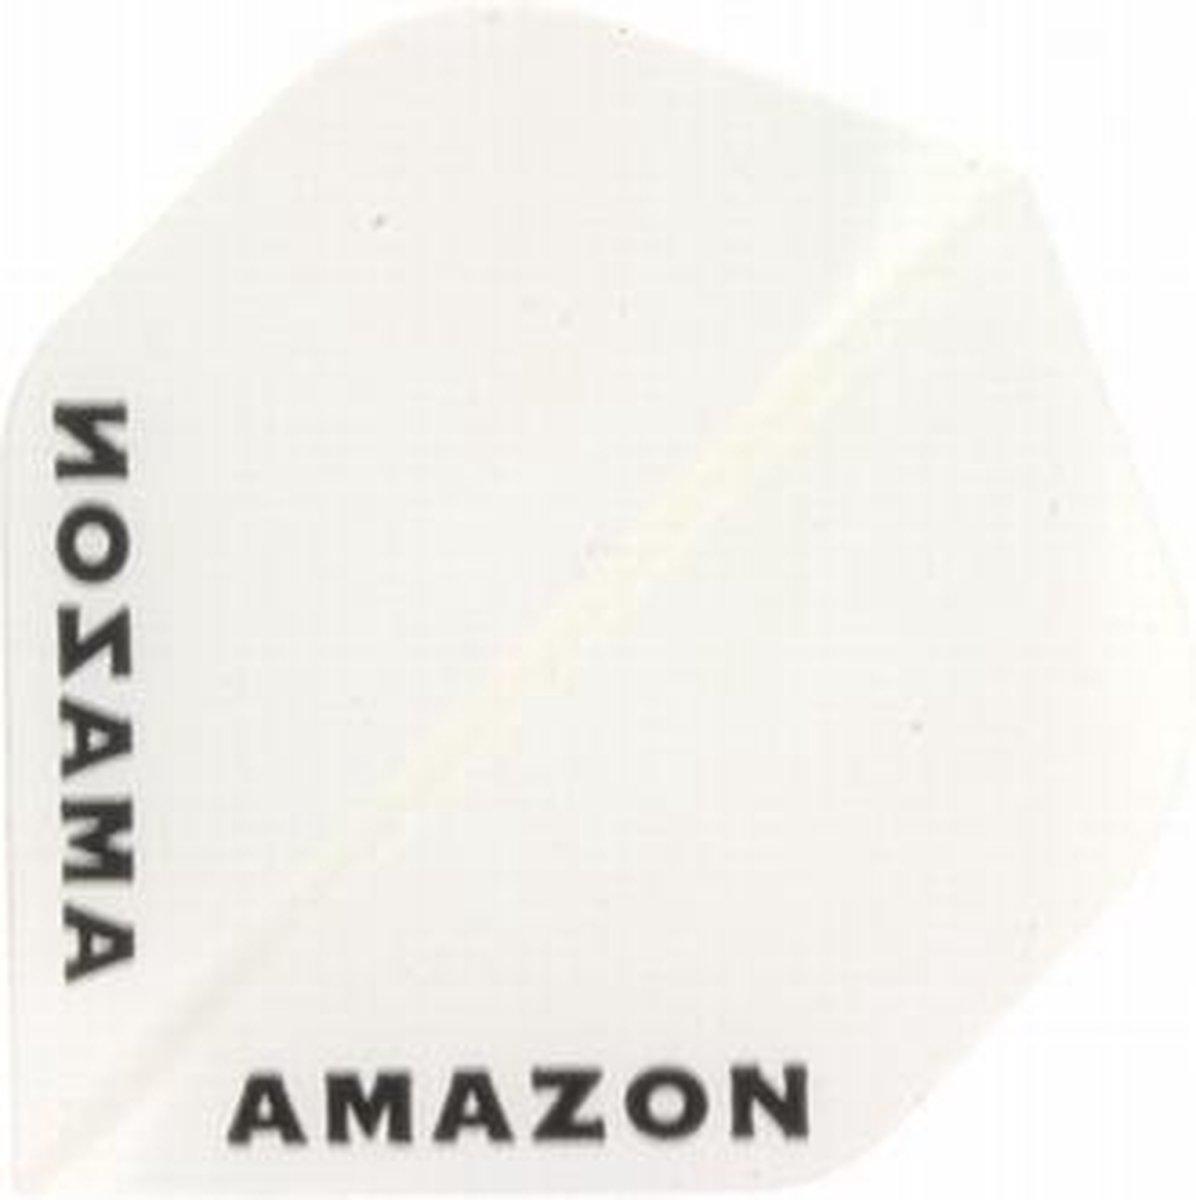 5 sets (15 stuks) Ruthless flights Amazon Transparant Std Clear